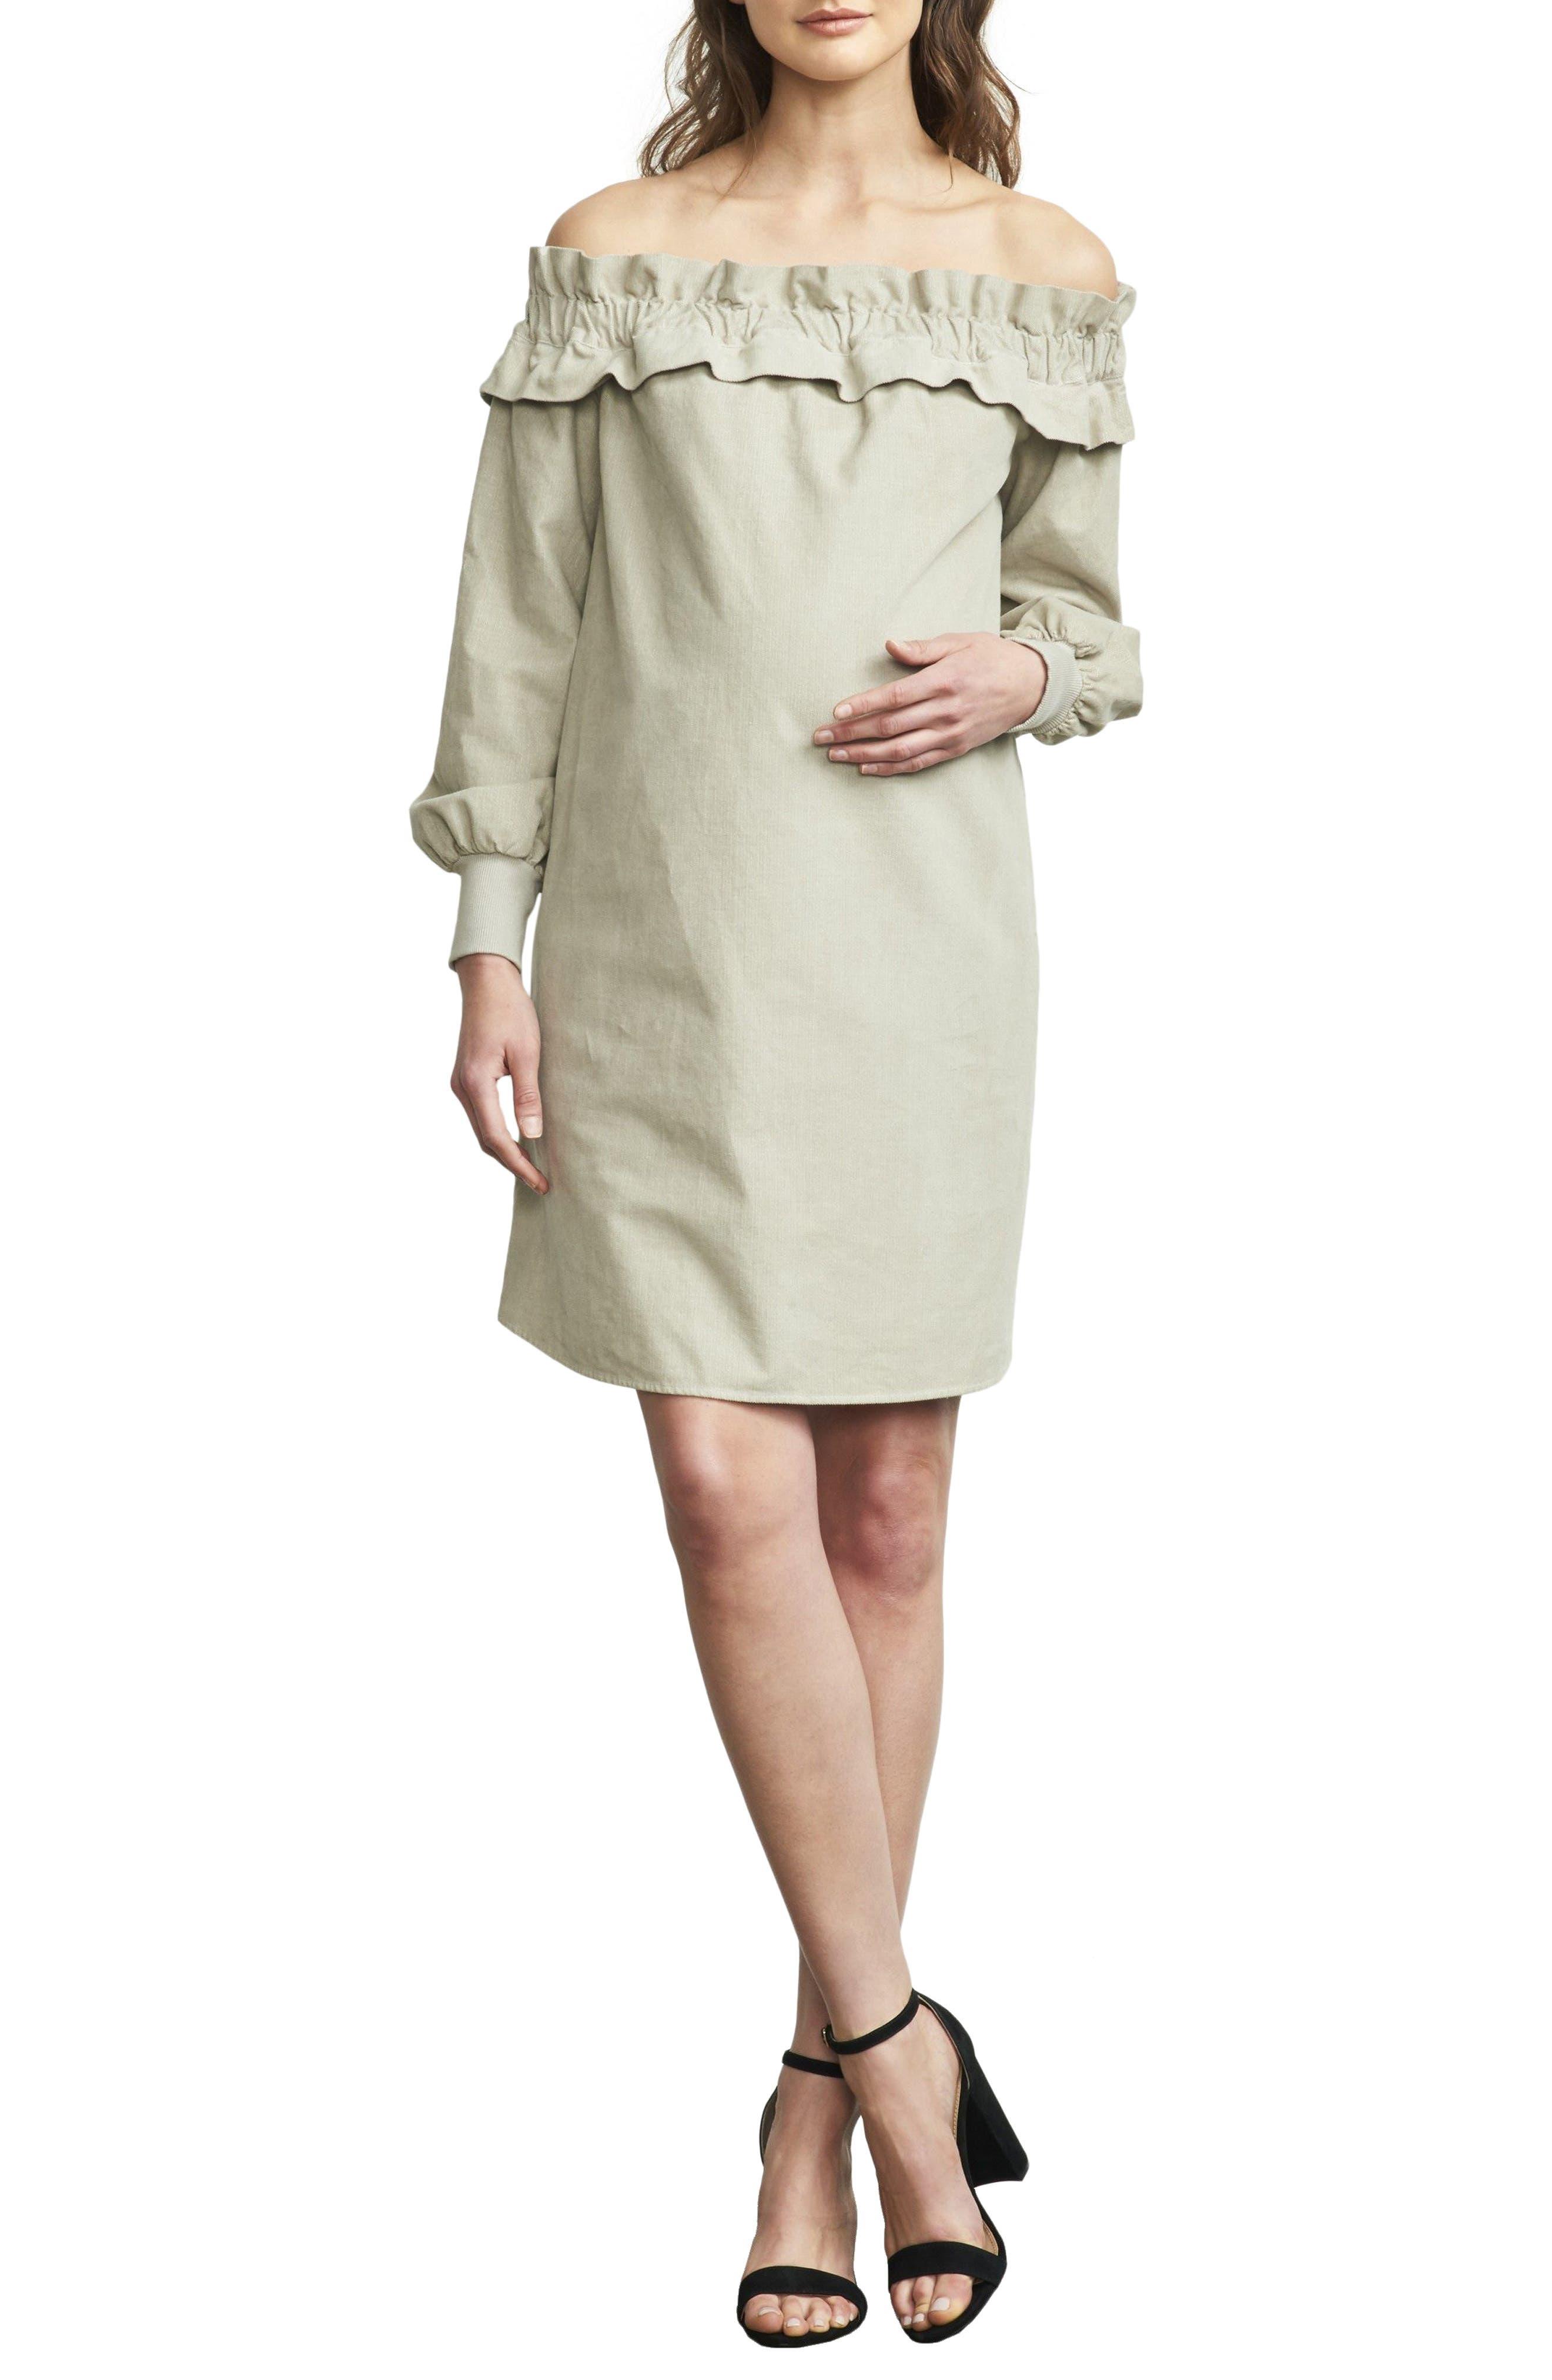 Maternal America Off The Shoulder Maternity Dress, Grey